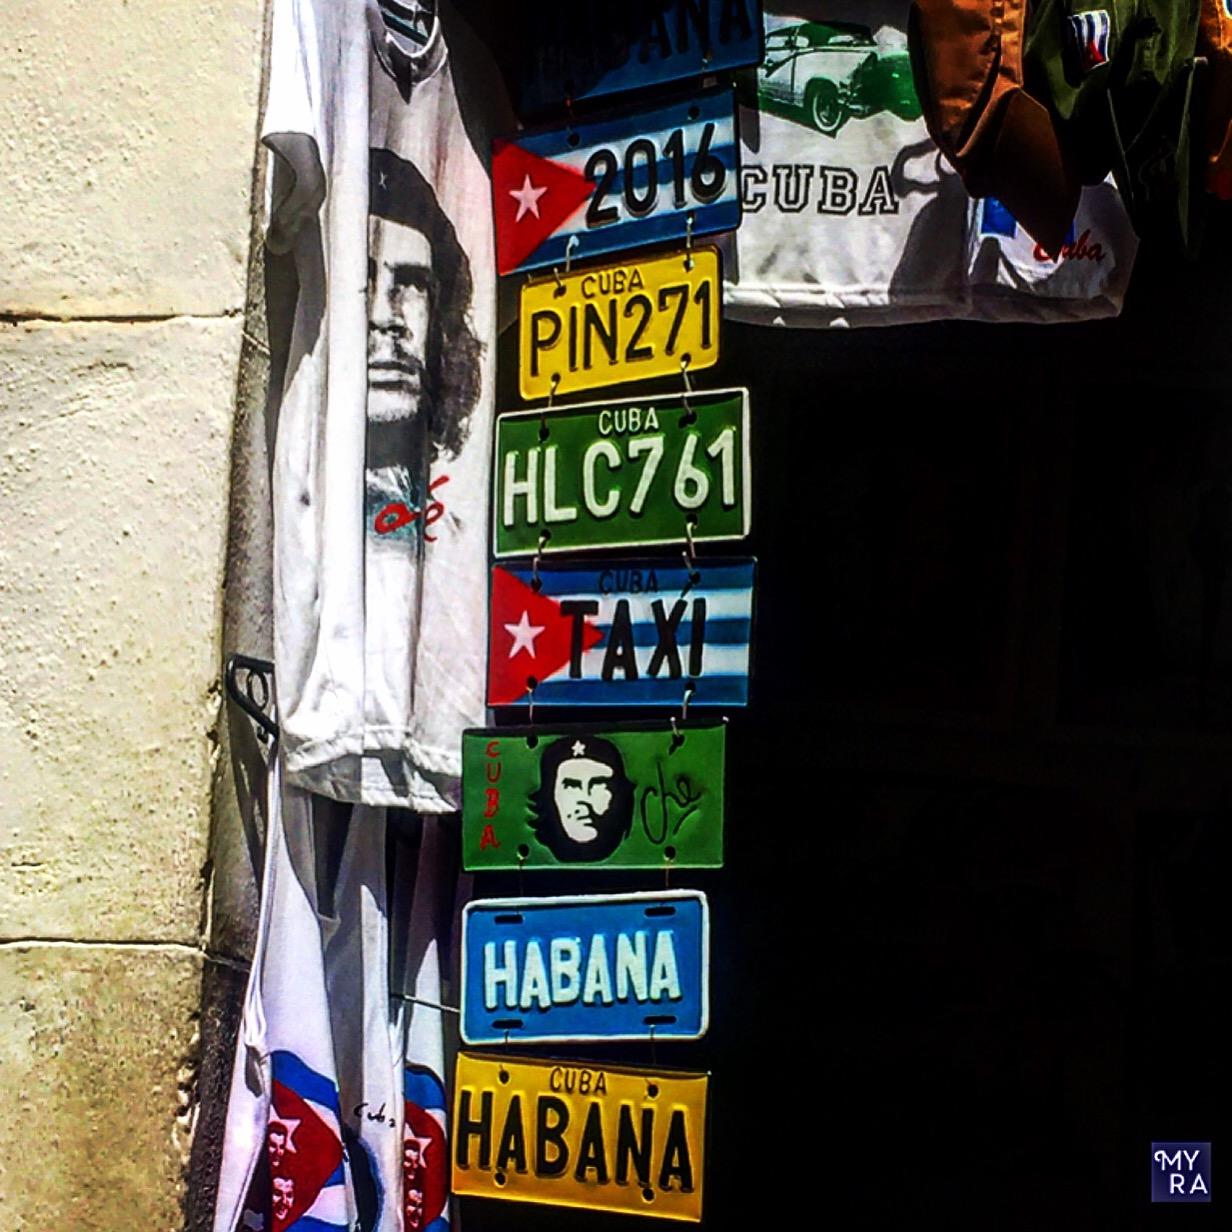 Cuban storefront